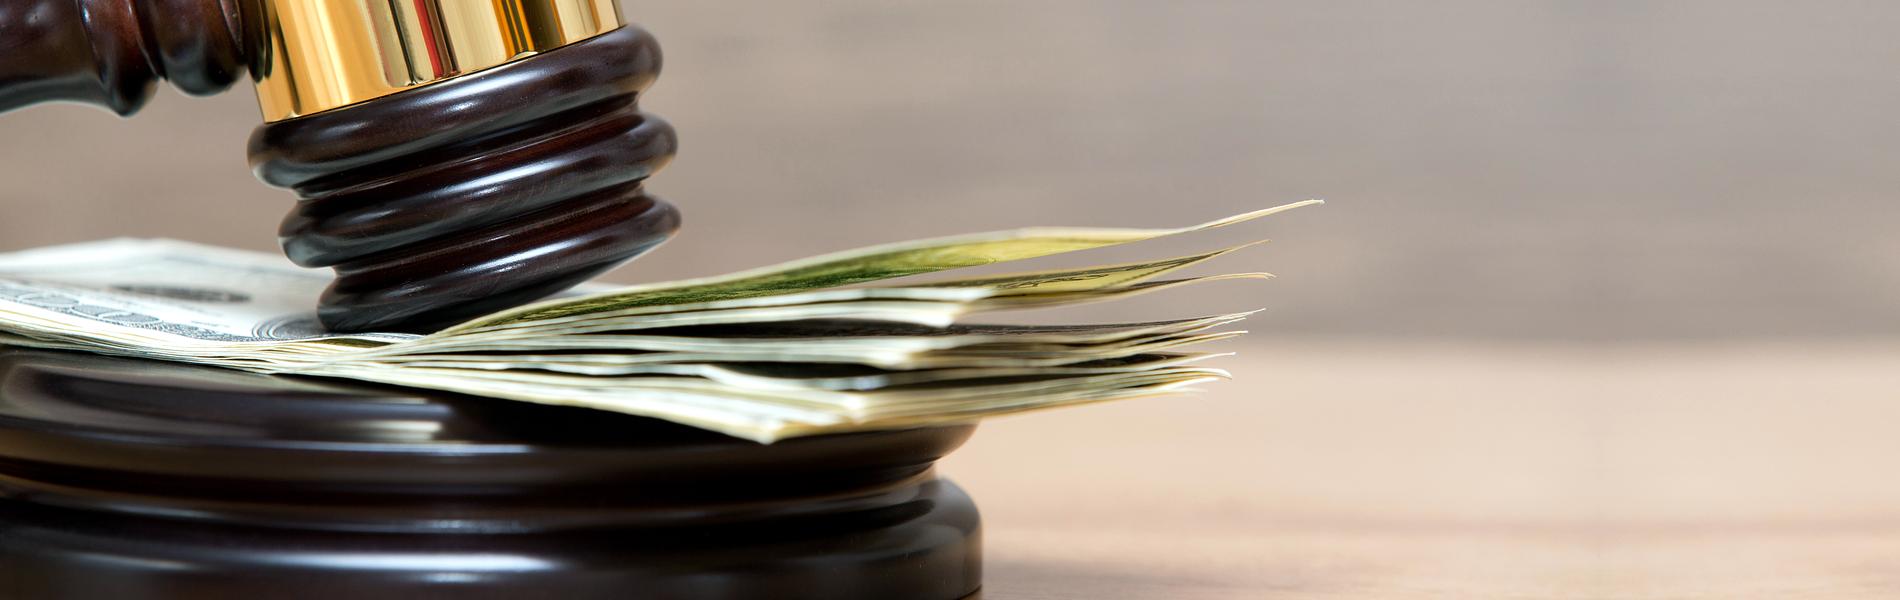 justice lawsuit patent troll